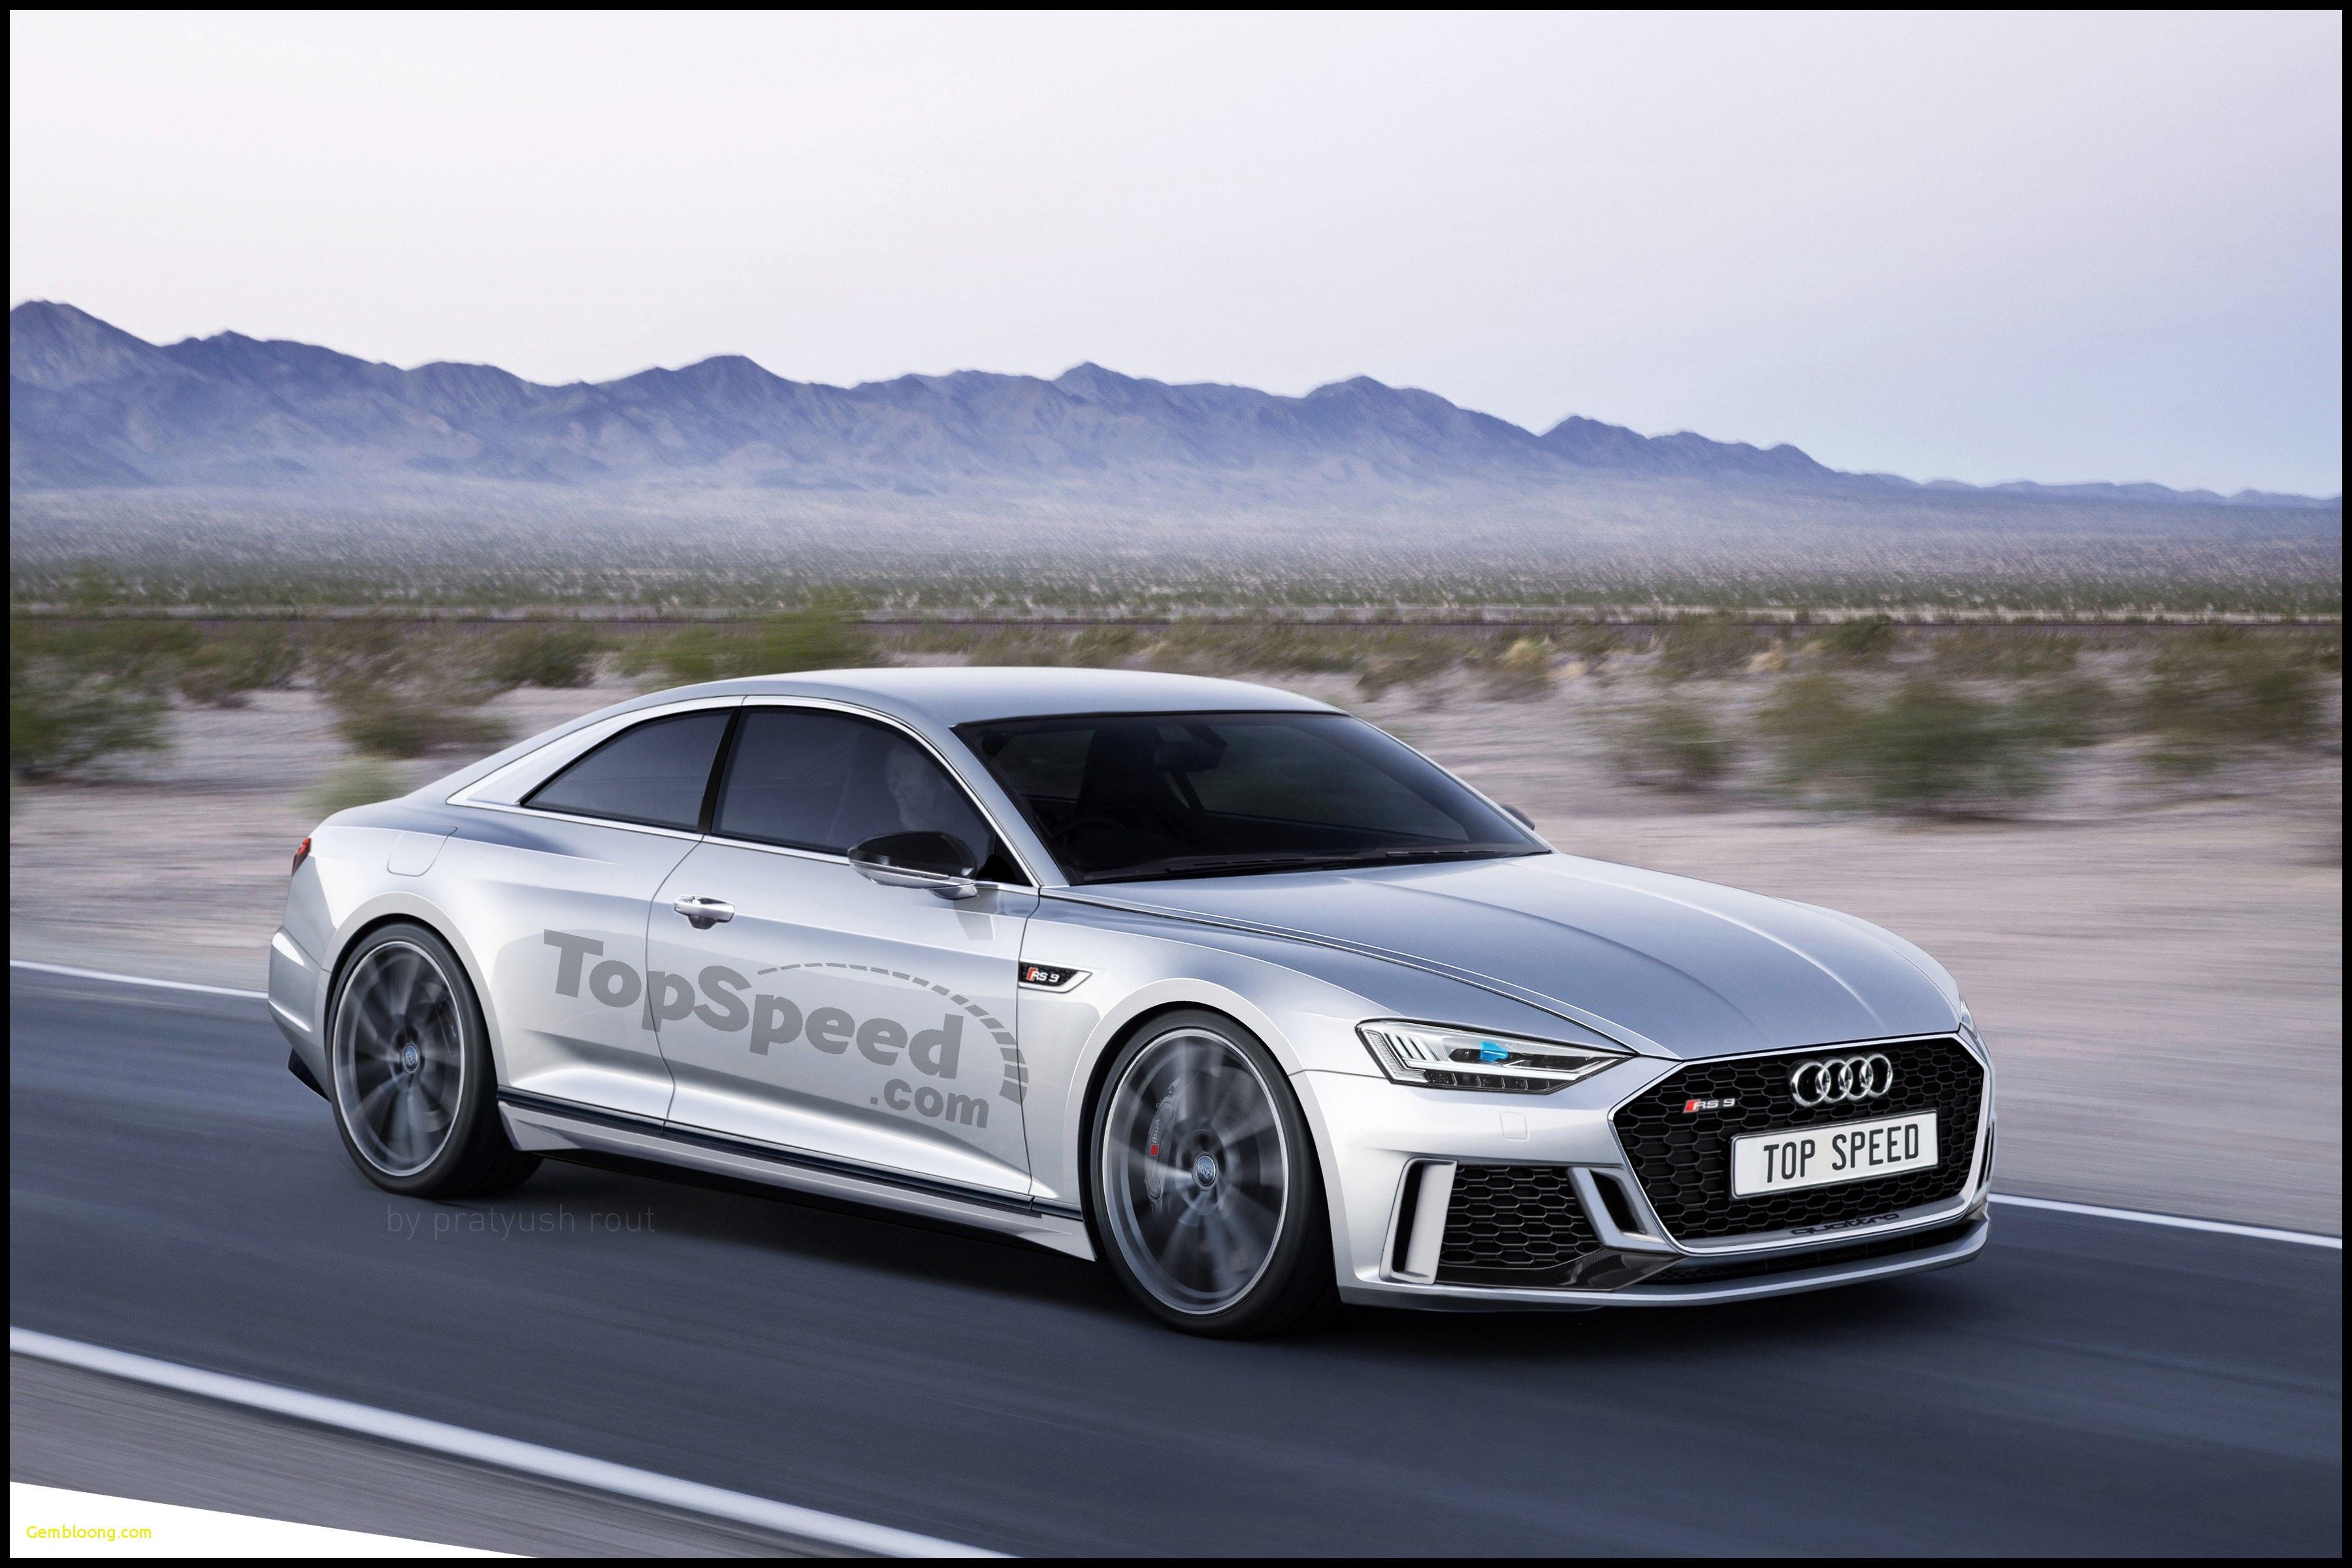 2019 Audi S7 Inspirational 2019 Audi Rs5 Tdi Neues Neuer Audi A7 Best Car Reviews